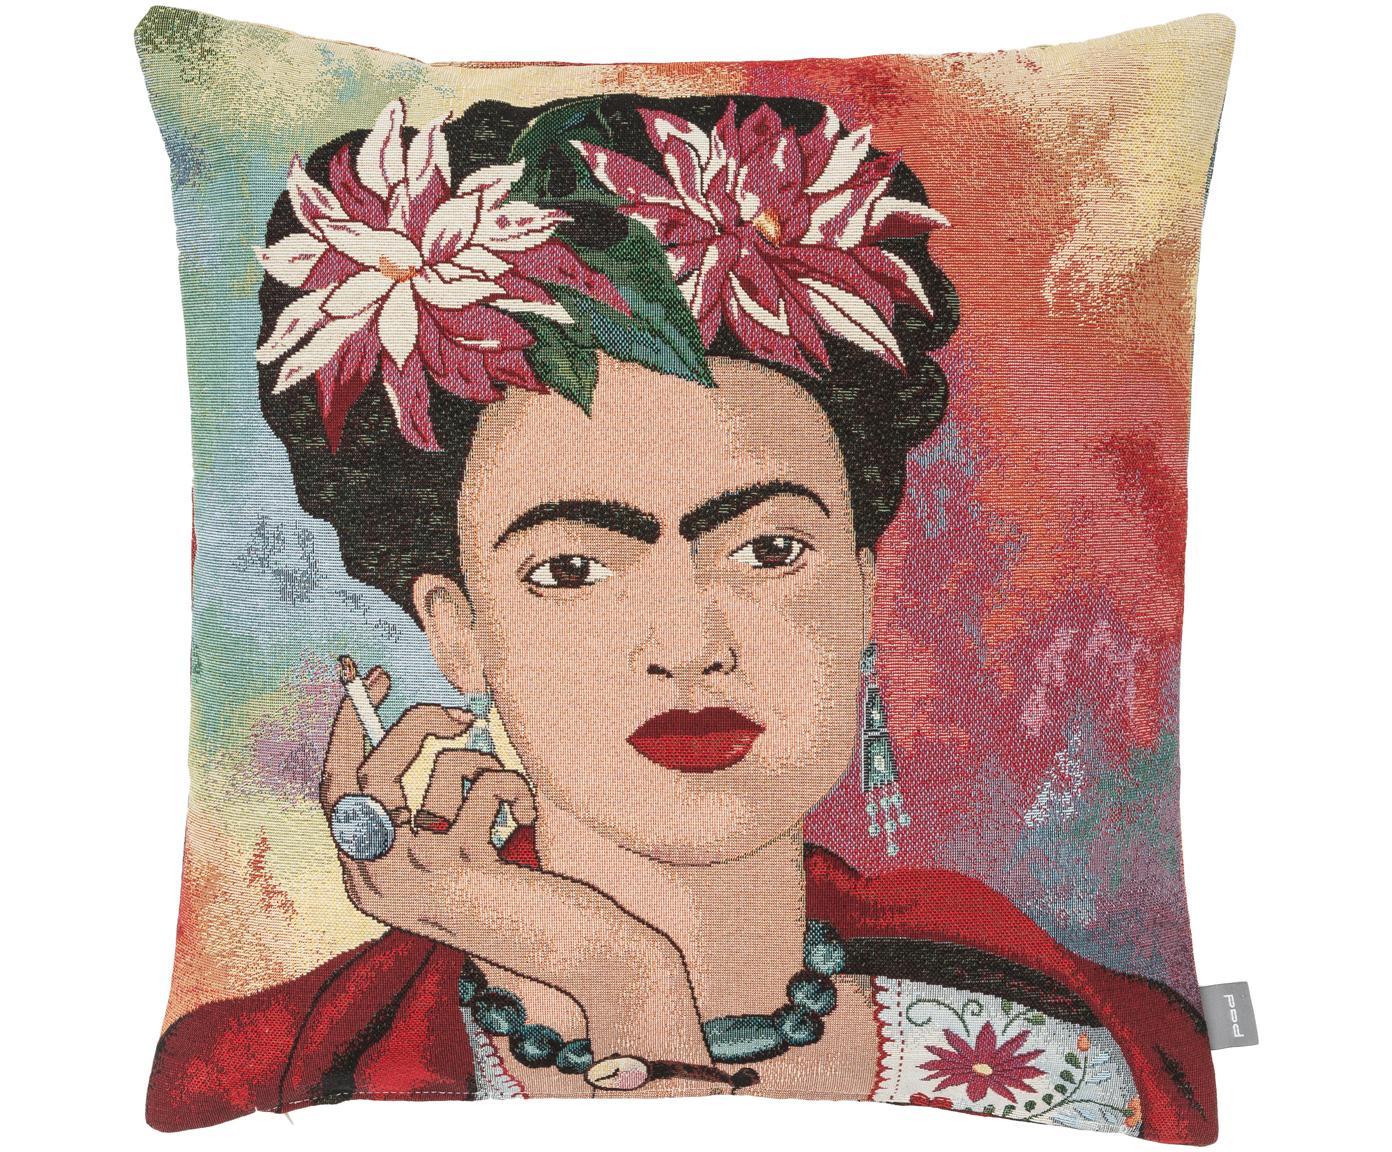 Kussenhoes Frida Kahlo, 50% katoen, 45% polyester, 5% polyacrylnitril, Multicolour, 45 x 45 cm